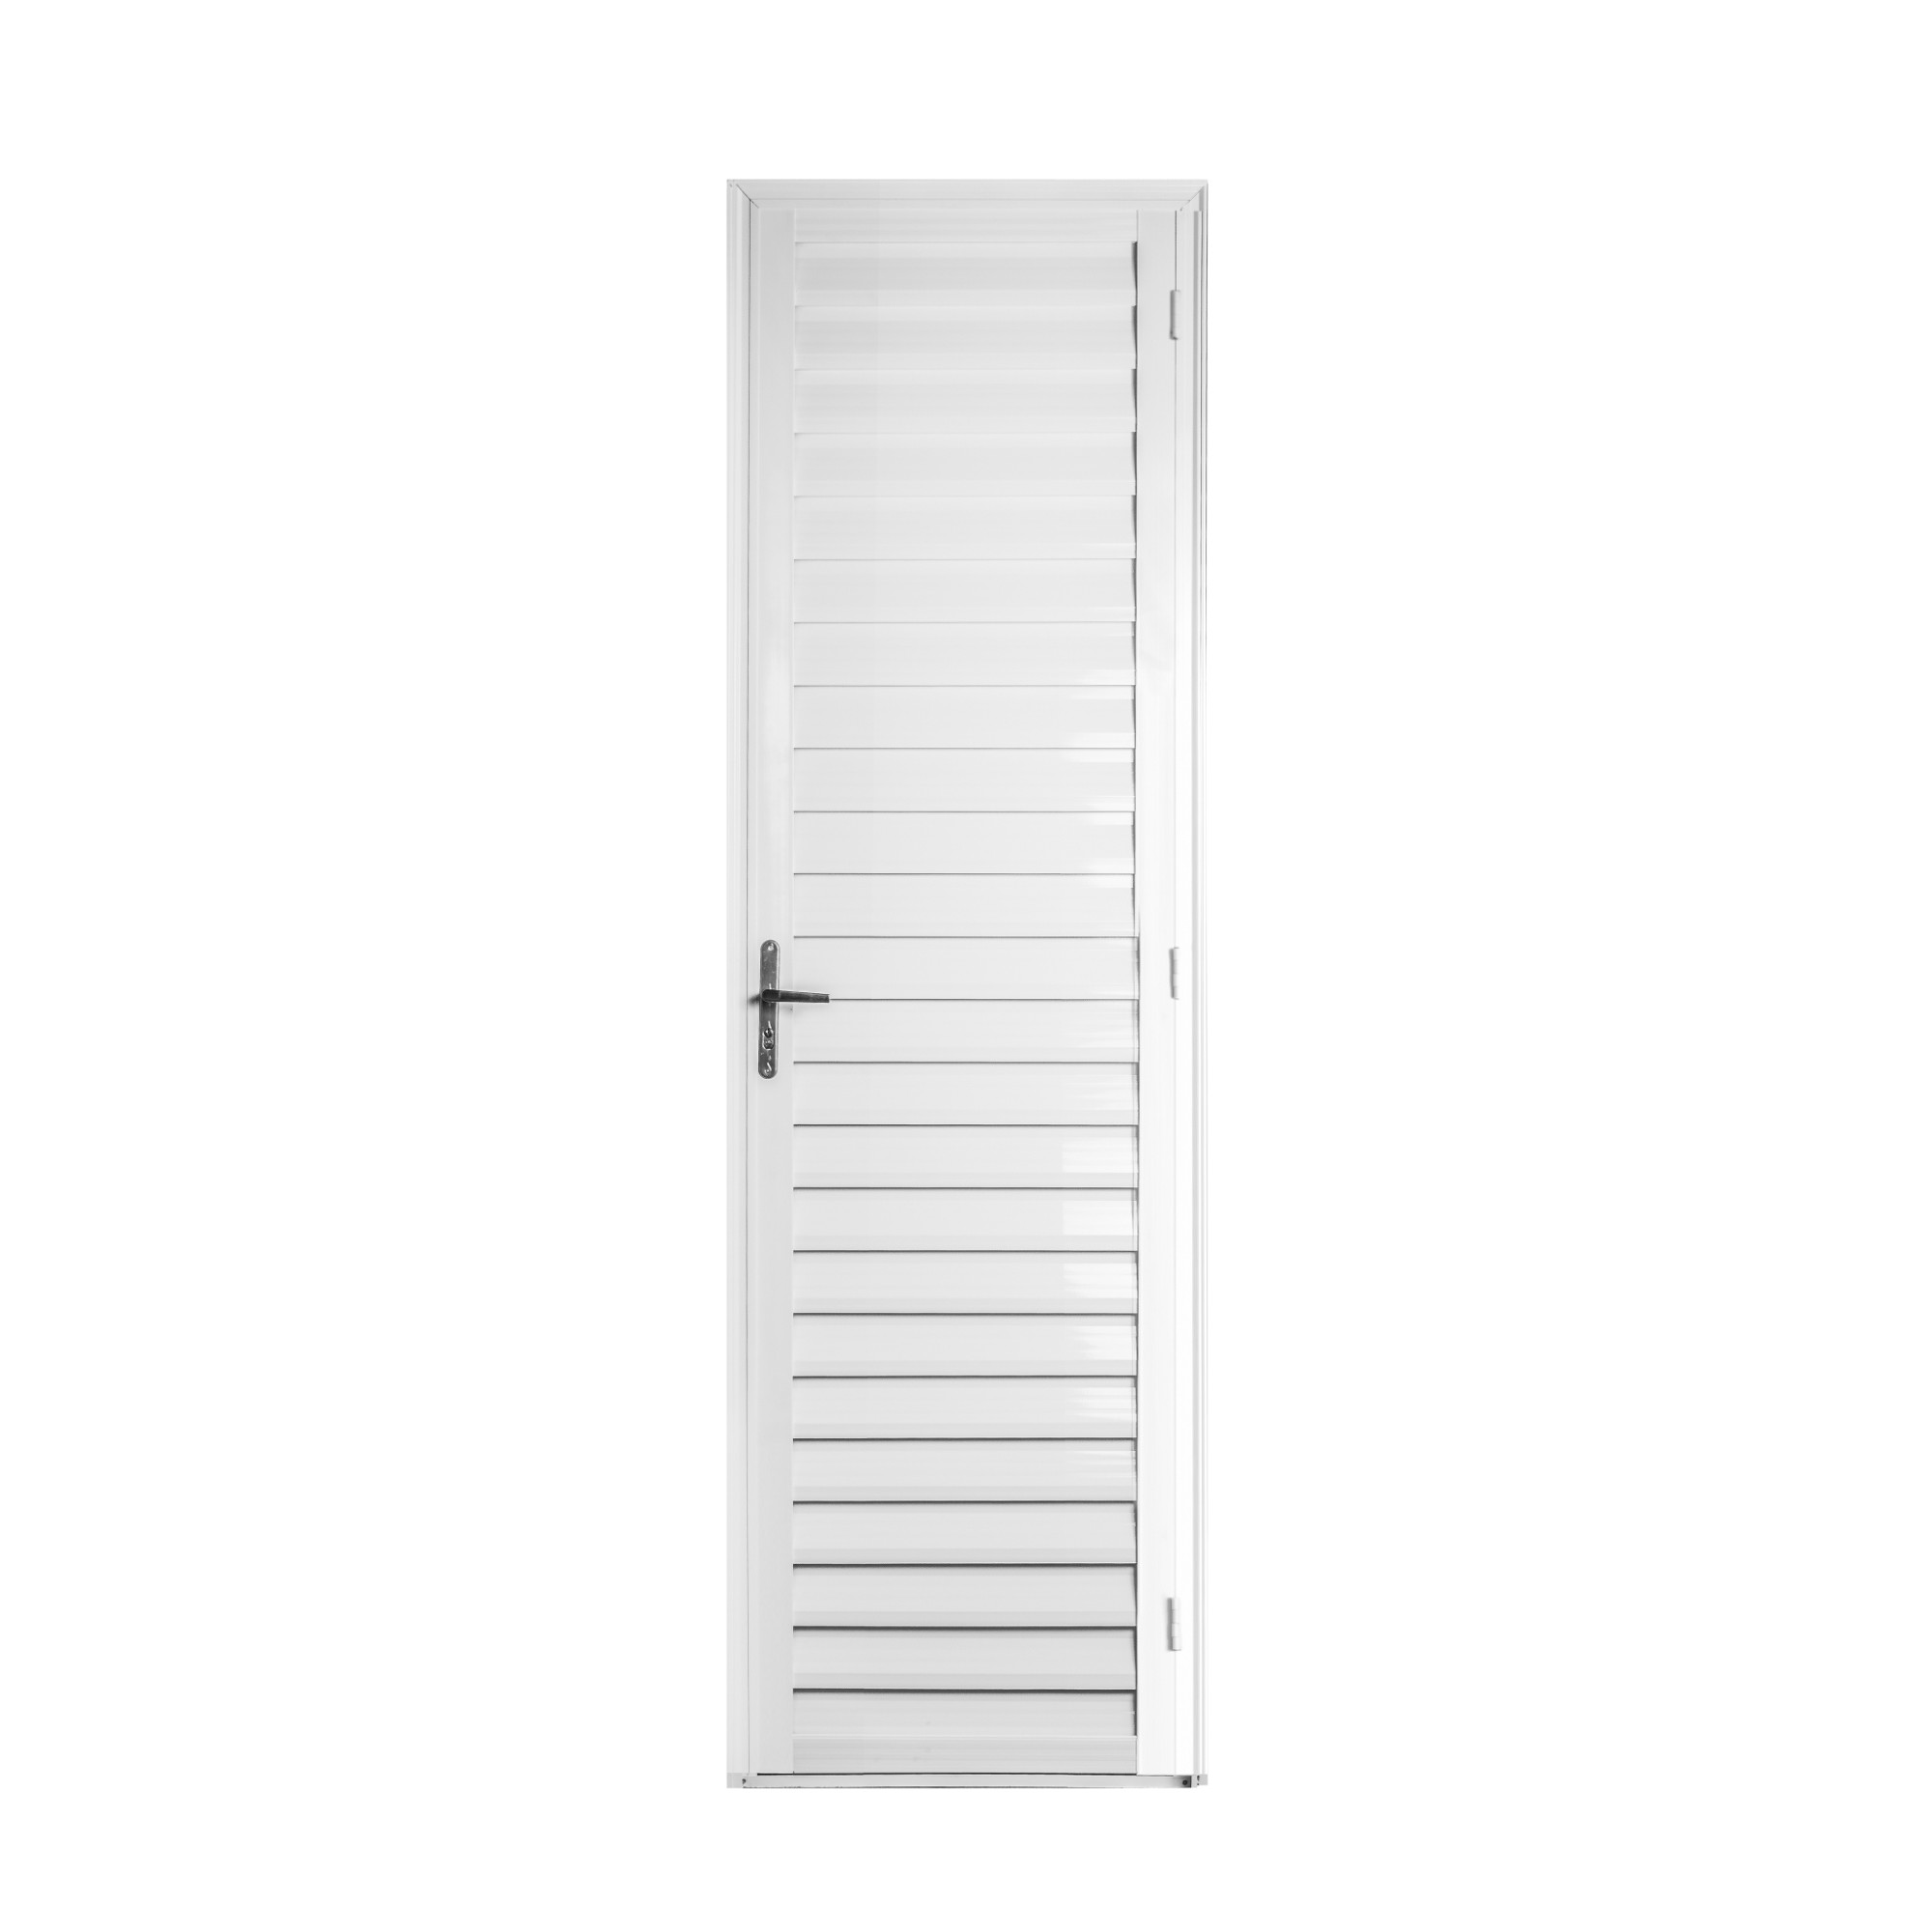 Porta de Abrir de Aluminio 210cm x 60cm Metalflex Lado Esquerdo - Aluvid